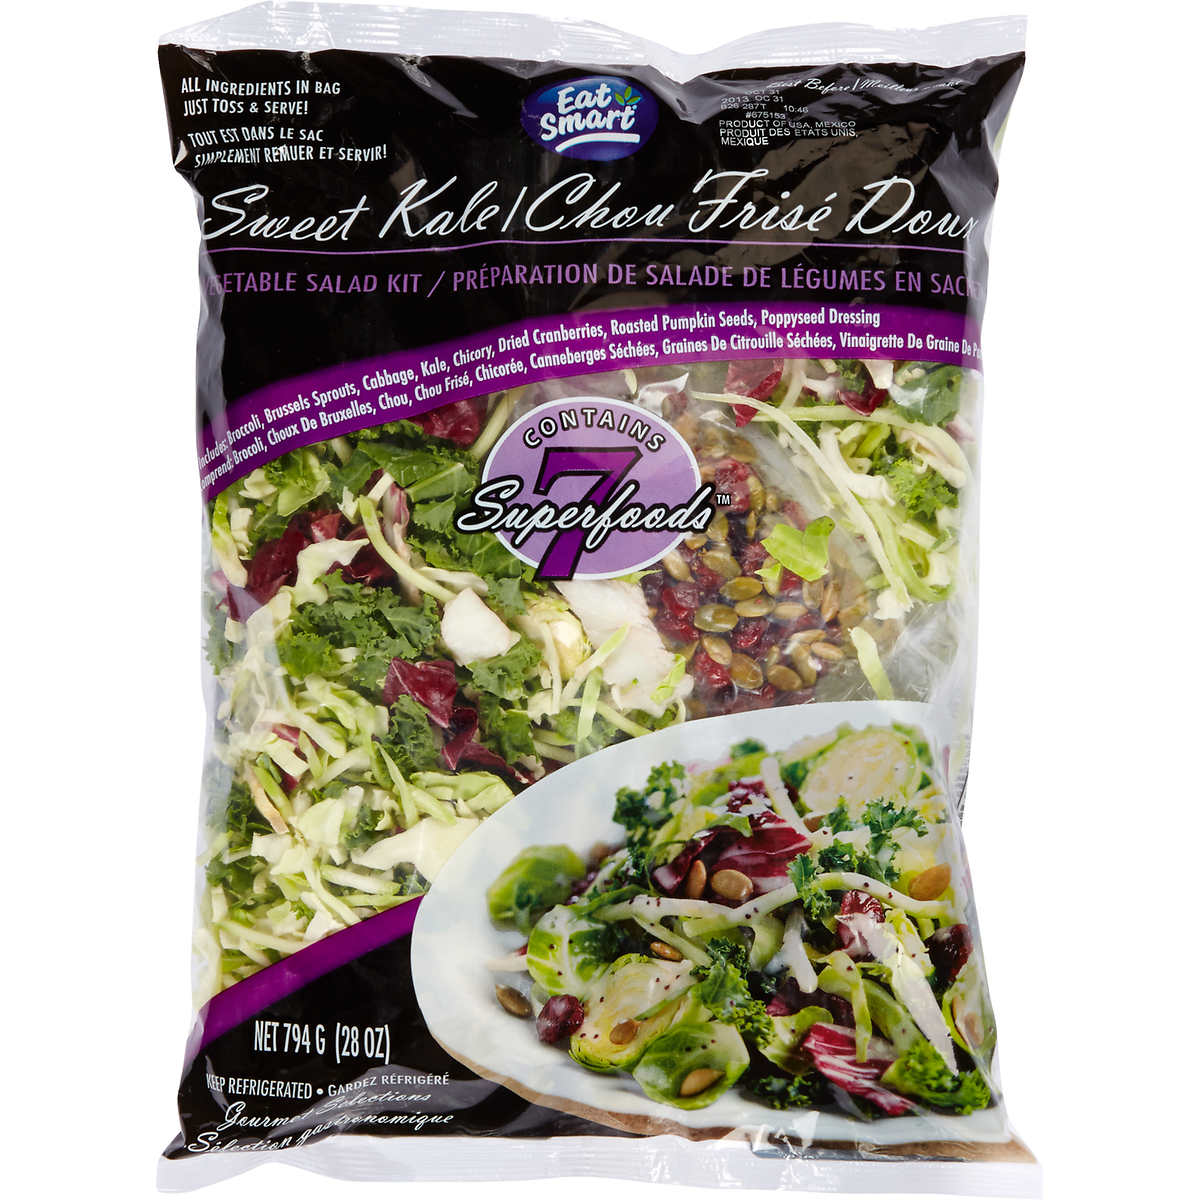 Costco Salad Kit